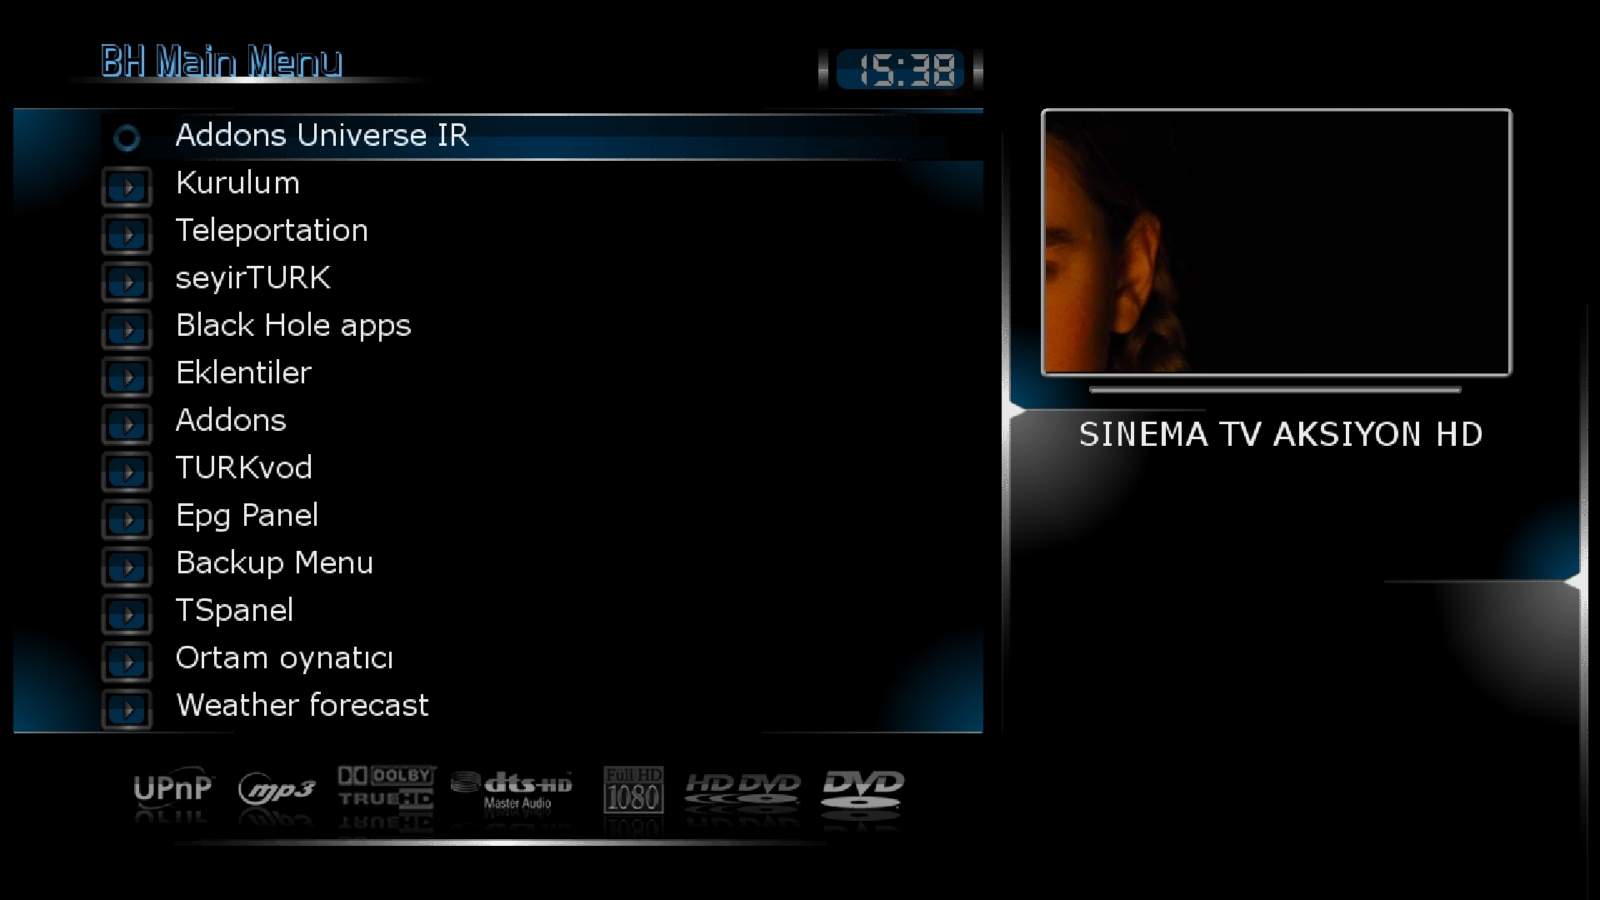 Black Hole Vu+ Solo2 2.0.3 Hyperspace  Backup By AYBERK 16.05.2013